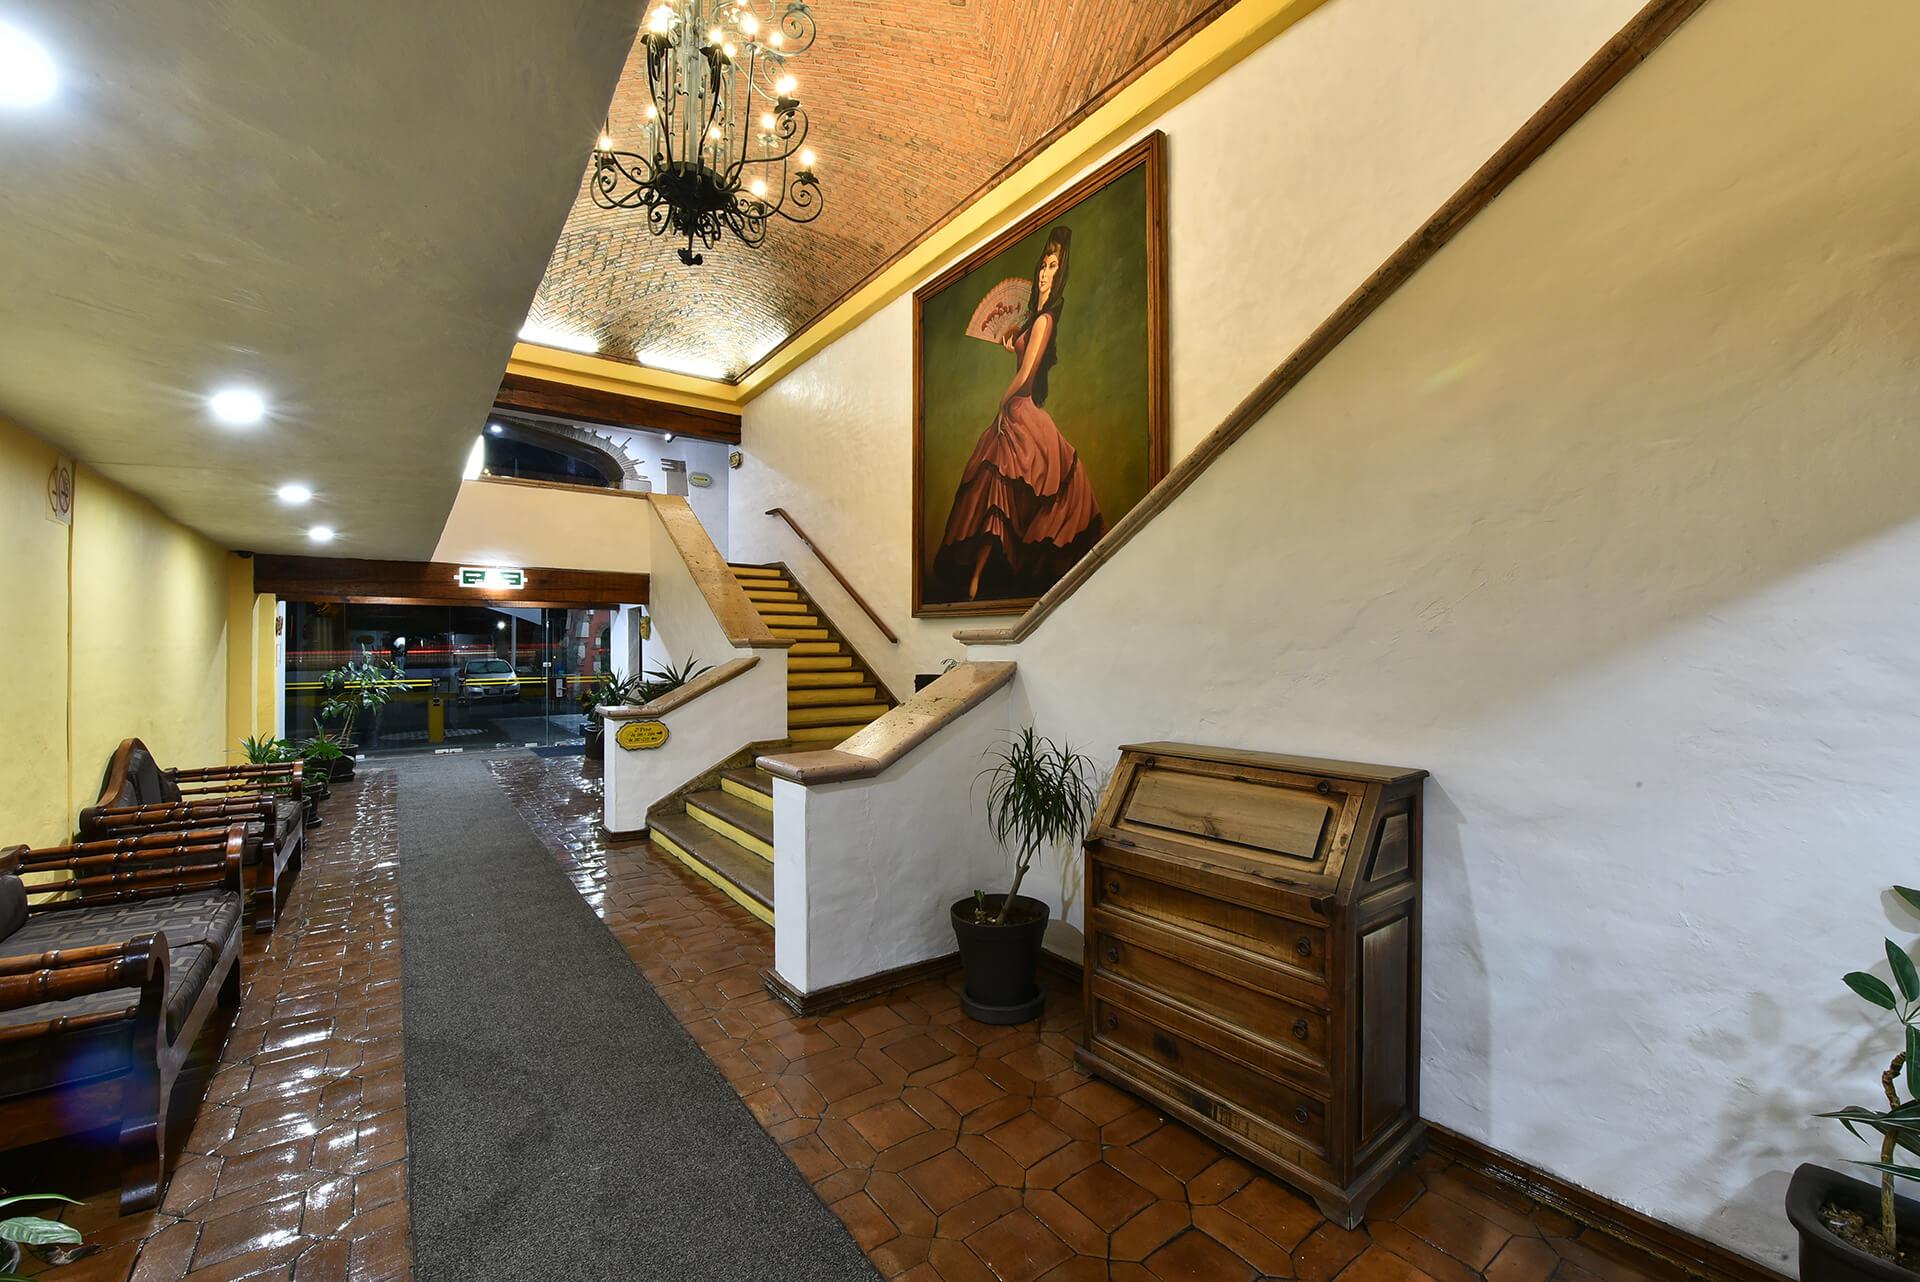 Holiday Inn Express Morelia - Imagen 2